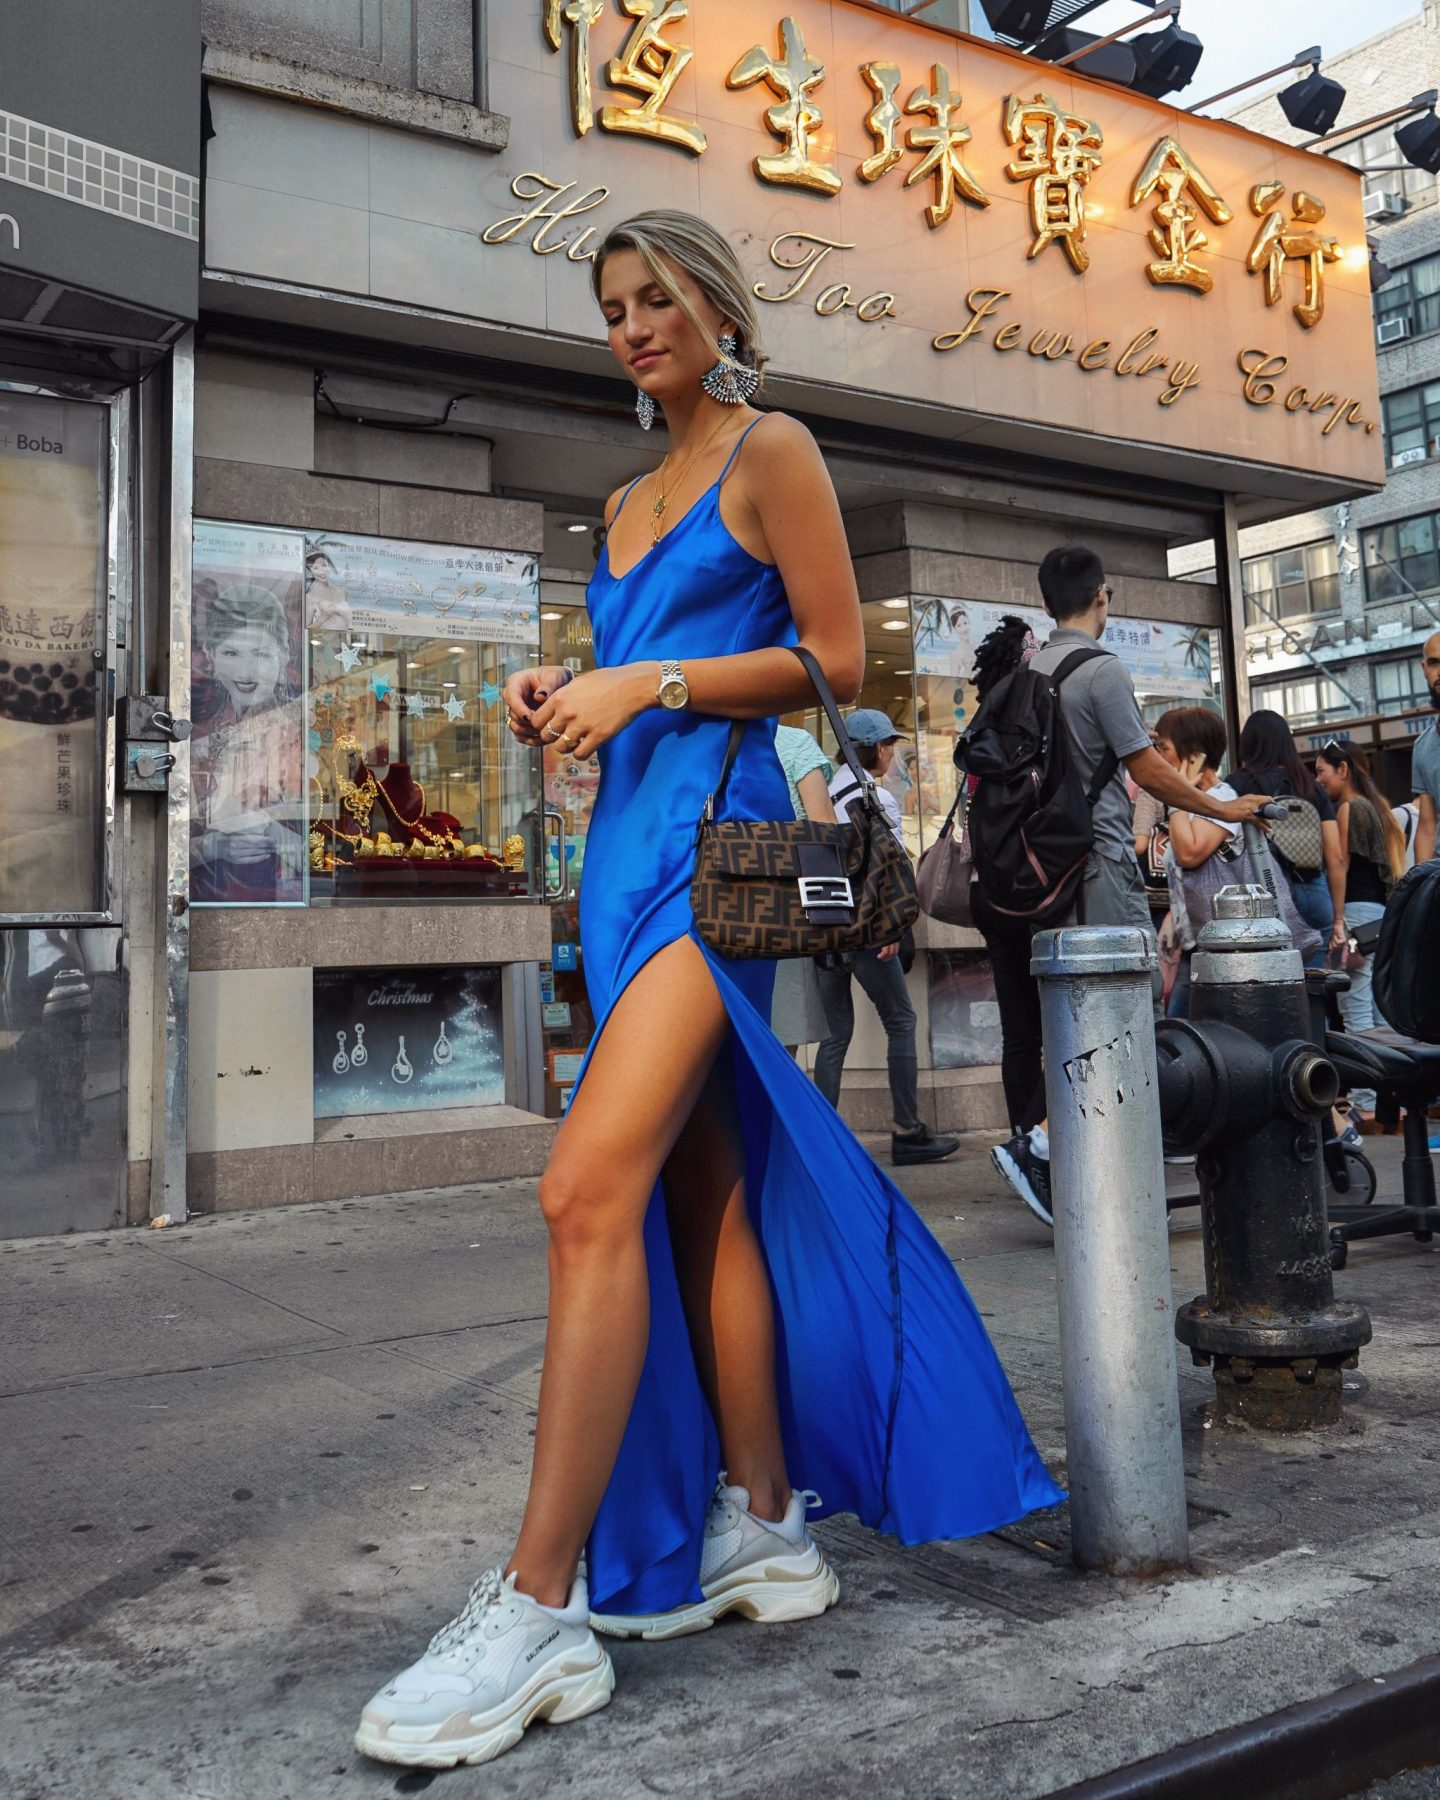 Cassandra DiMicco, Cass DiMicco, Dressed For Dreams, NYC, New York City, New York, Street Style NYC, Street Style 2018, NYC Street Style, NYC Outfit Inspo Street Style Outfits, 2018 Trends, Summer Style, Summer Outfit Inspo, NYC Fashion Blogger, NYC Fashion Blogger, NYC to do list, NYC to do, NYC bucket list, NYC Instagram Spots, dannijo, dannijo earrings, dannijo jewelry, dannijo dress, balenciaga triple s sneakers, balenciaga sneakers, balenciaga chunky sneakers, slip dress, fendi, vintage fendi, fendi zucca print, chinatown manhattan